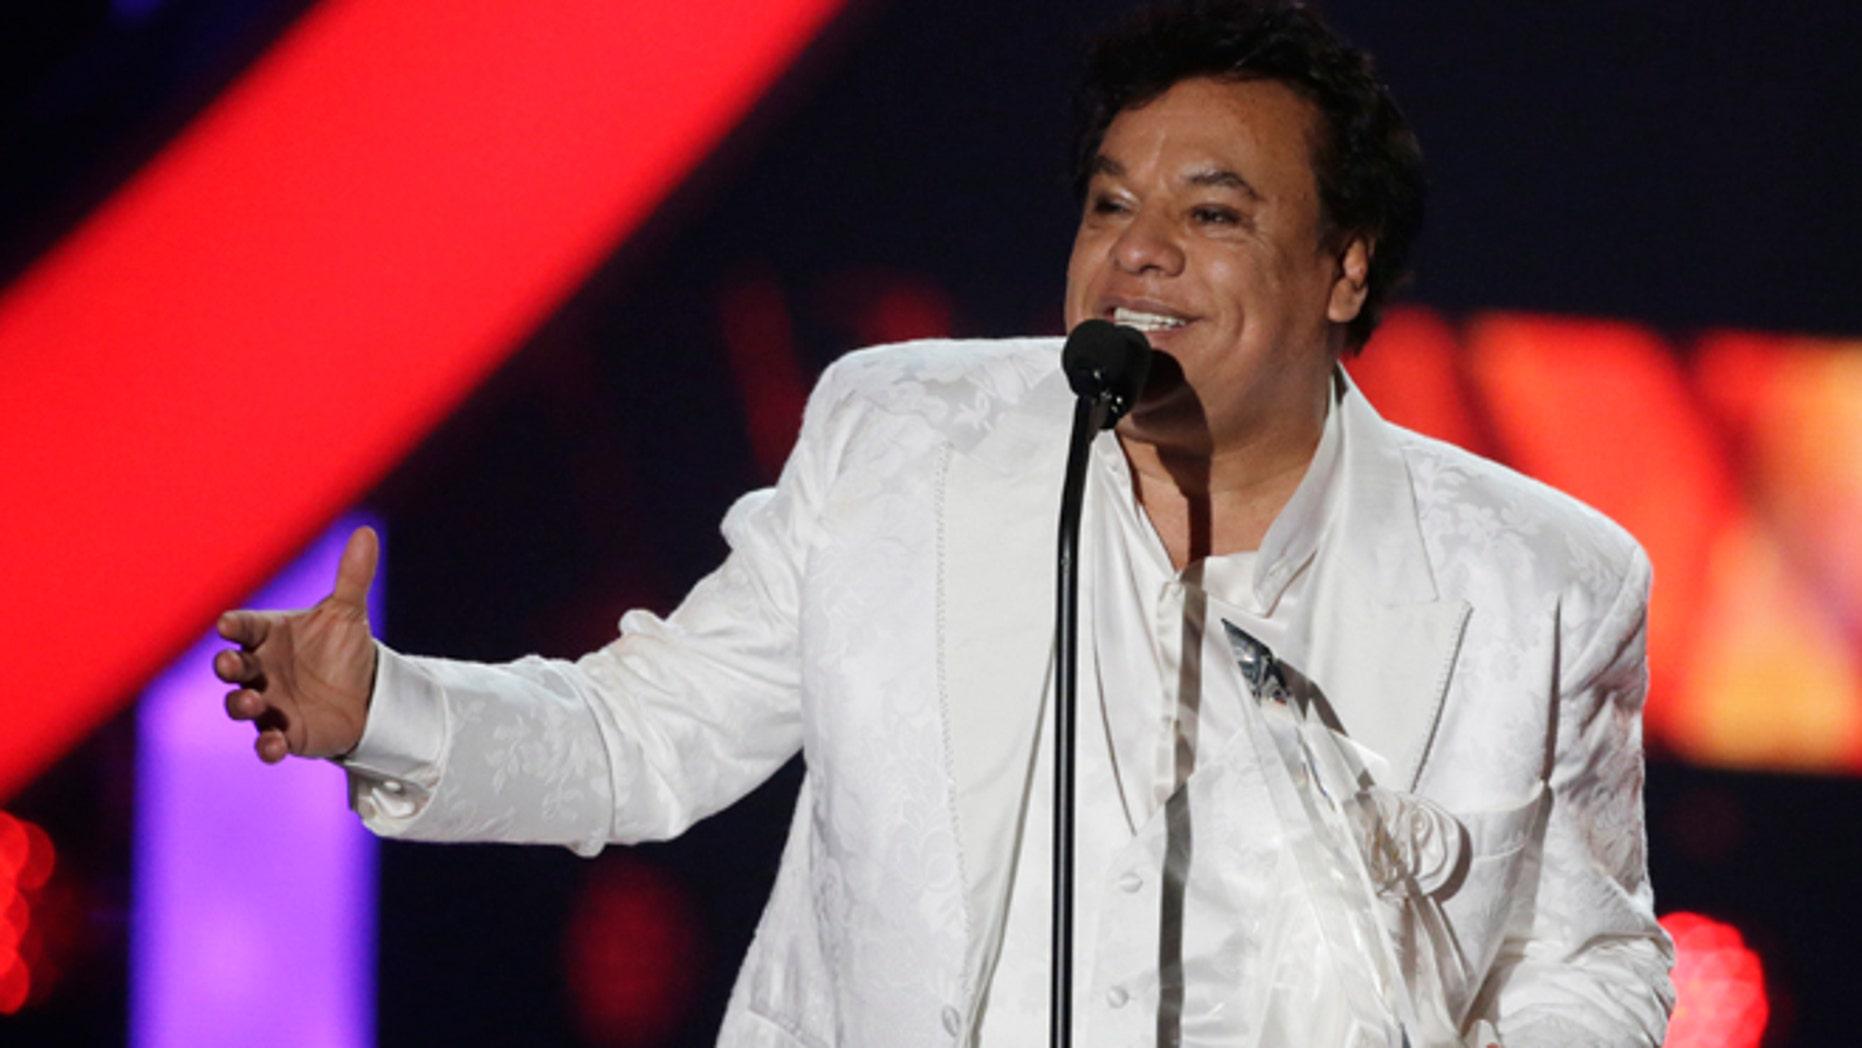 In this April 28, 2016, file photo, singer Juan Gabriel receives the Star Award at the Latin Billboard Awards, in Coral Gables, Fla.